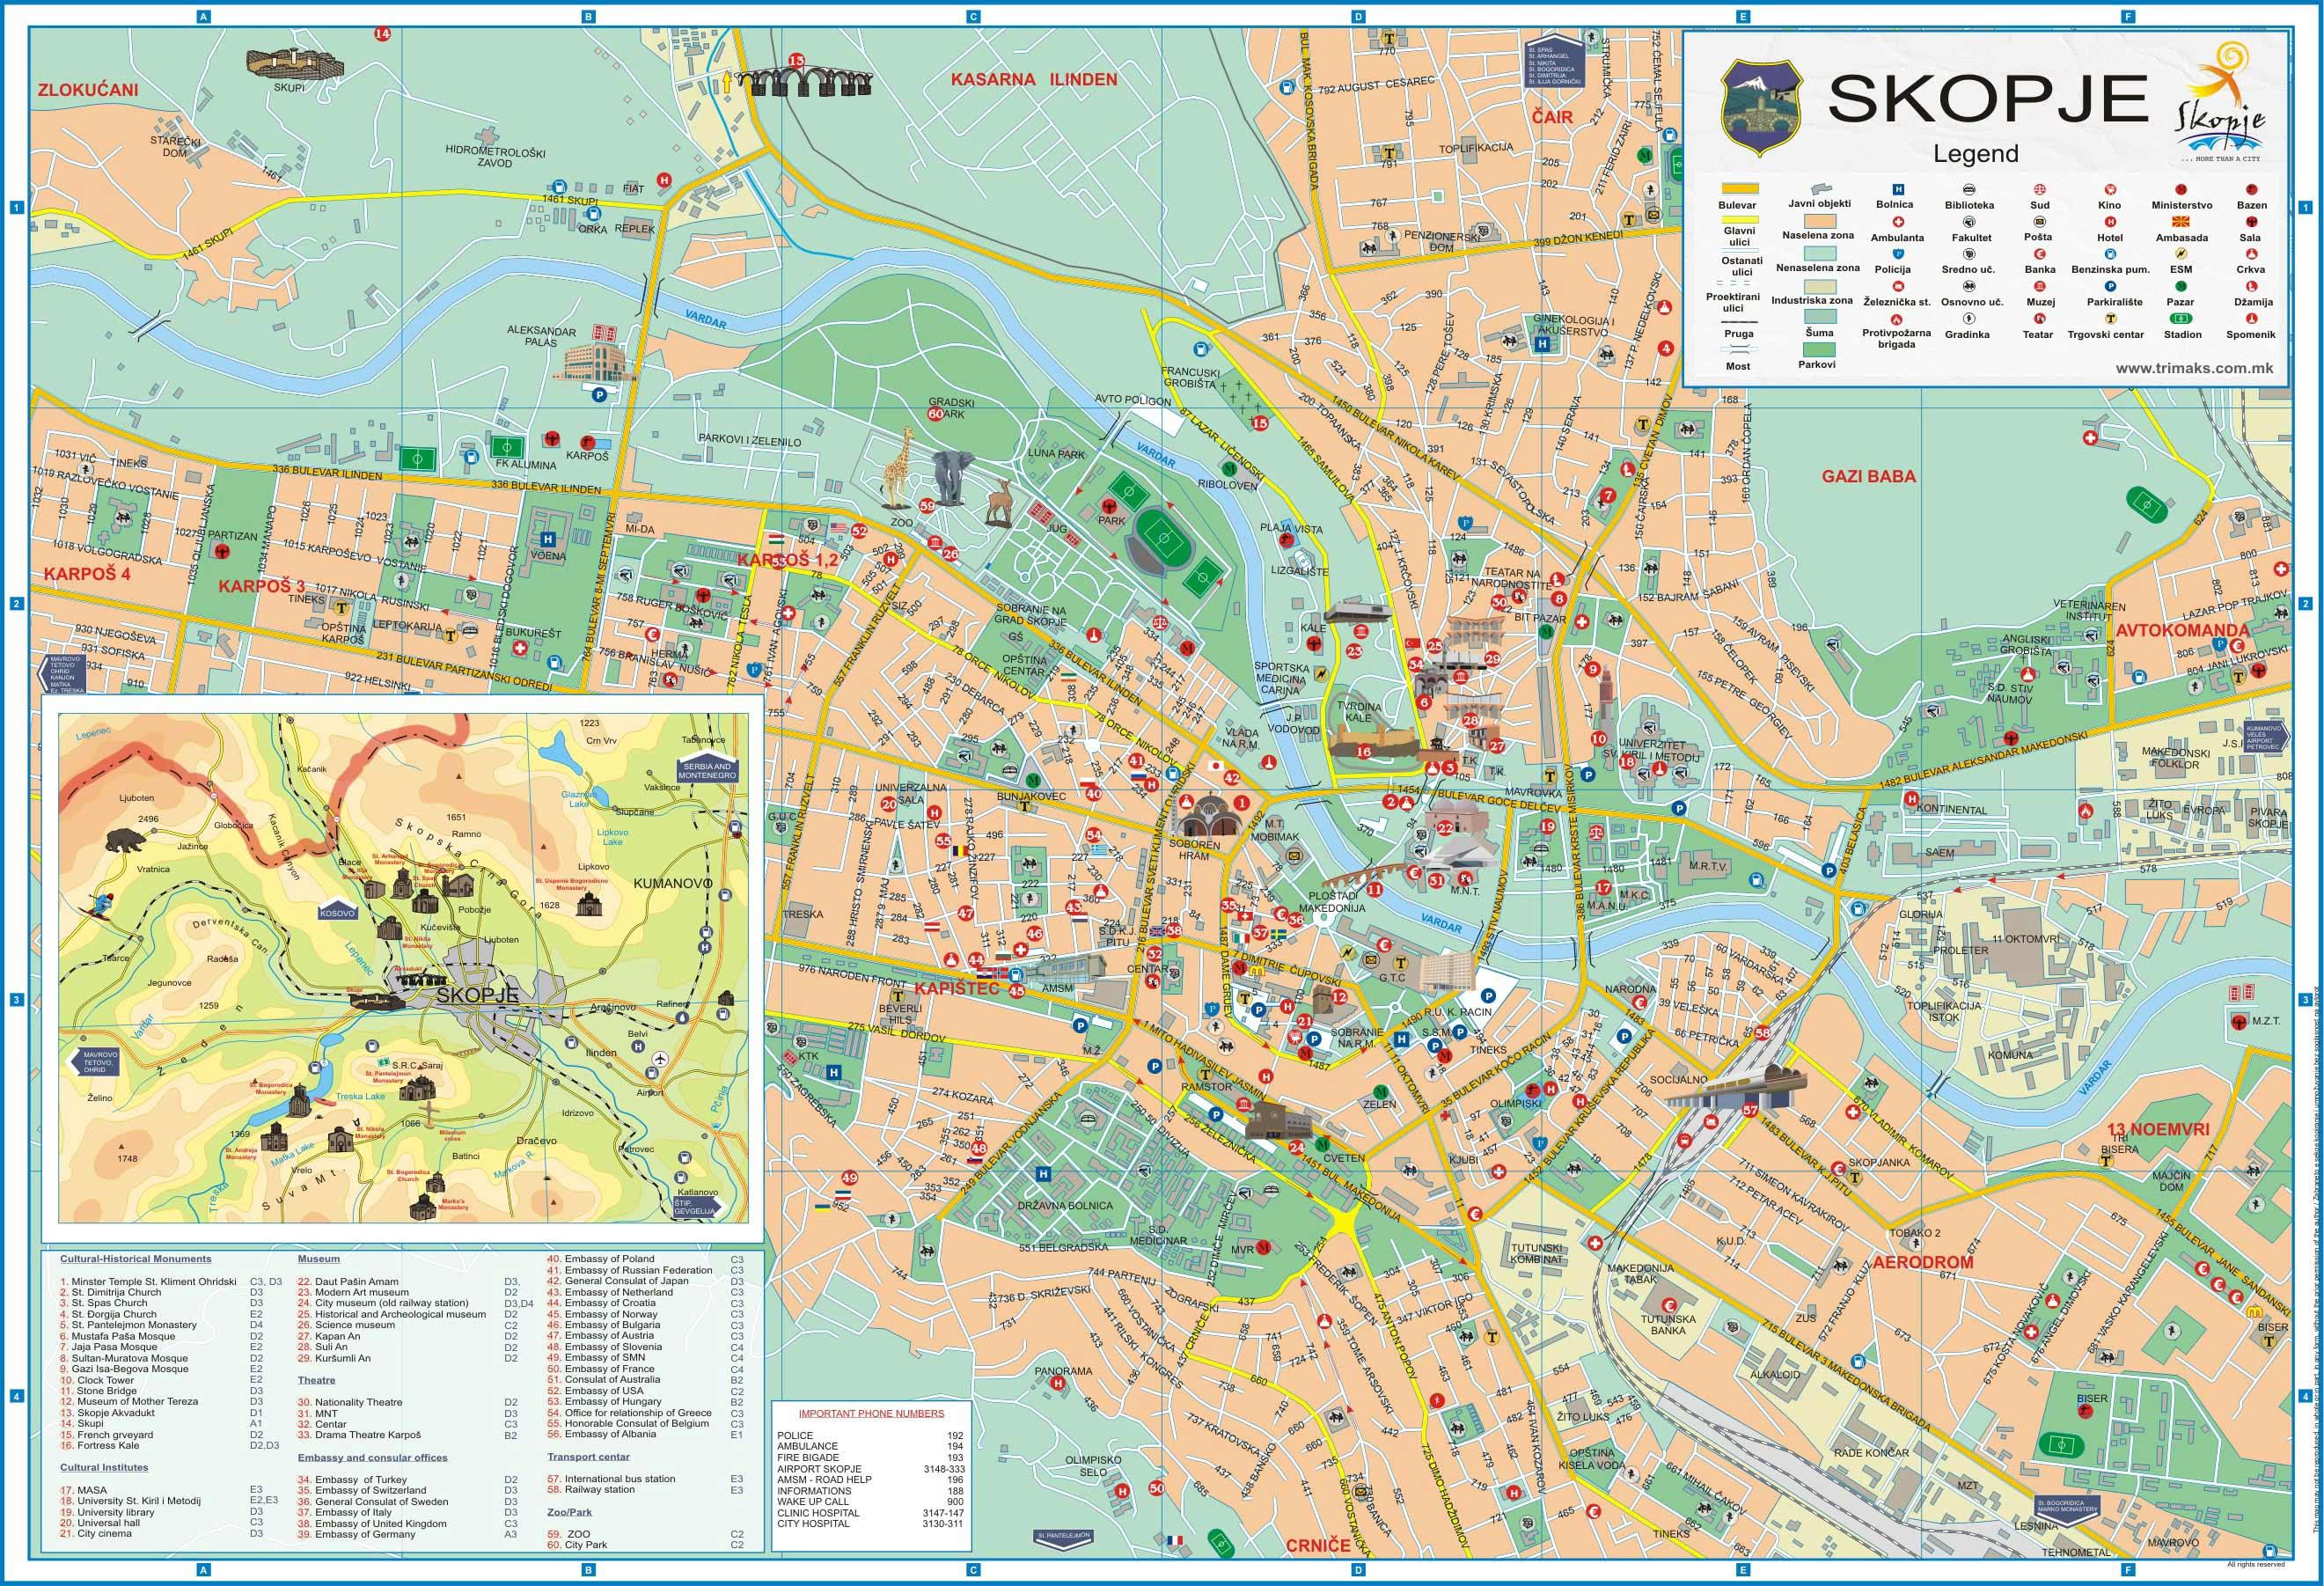 Mapa Monumentos Skopje